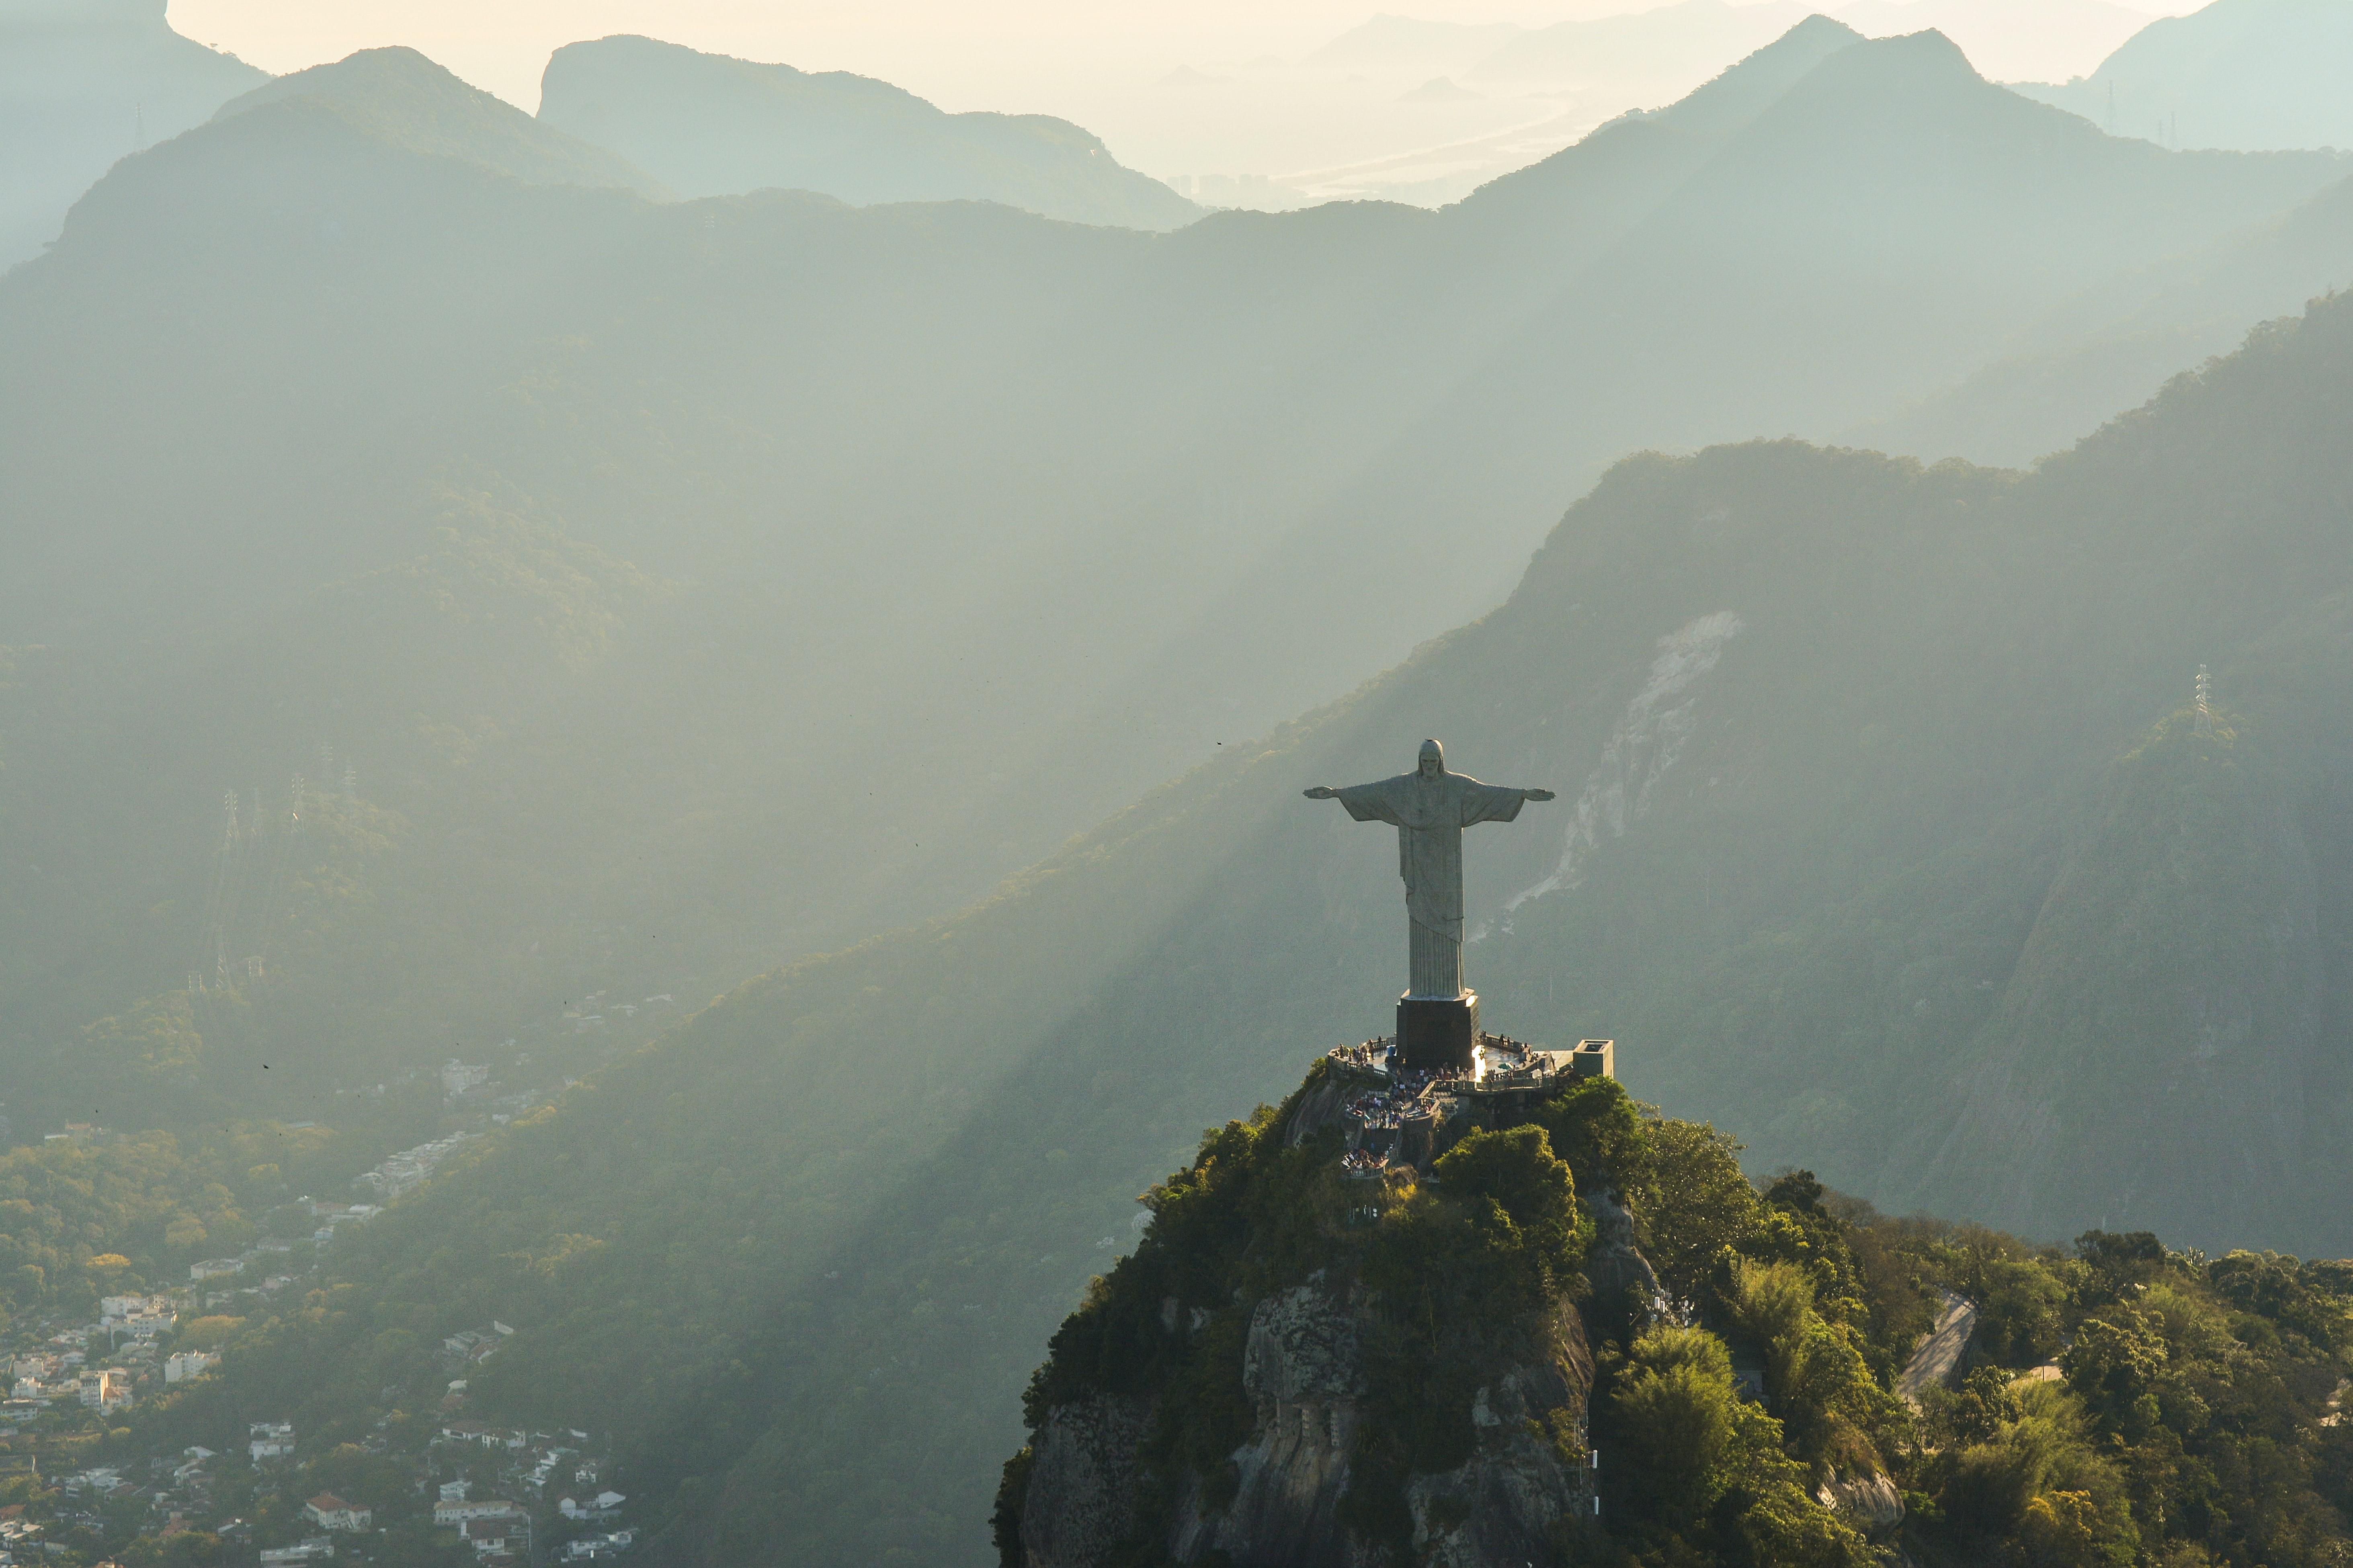 Brazil Photo by Raphael Nogueira on Unsplash